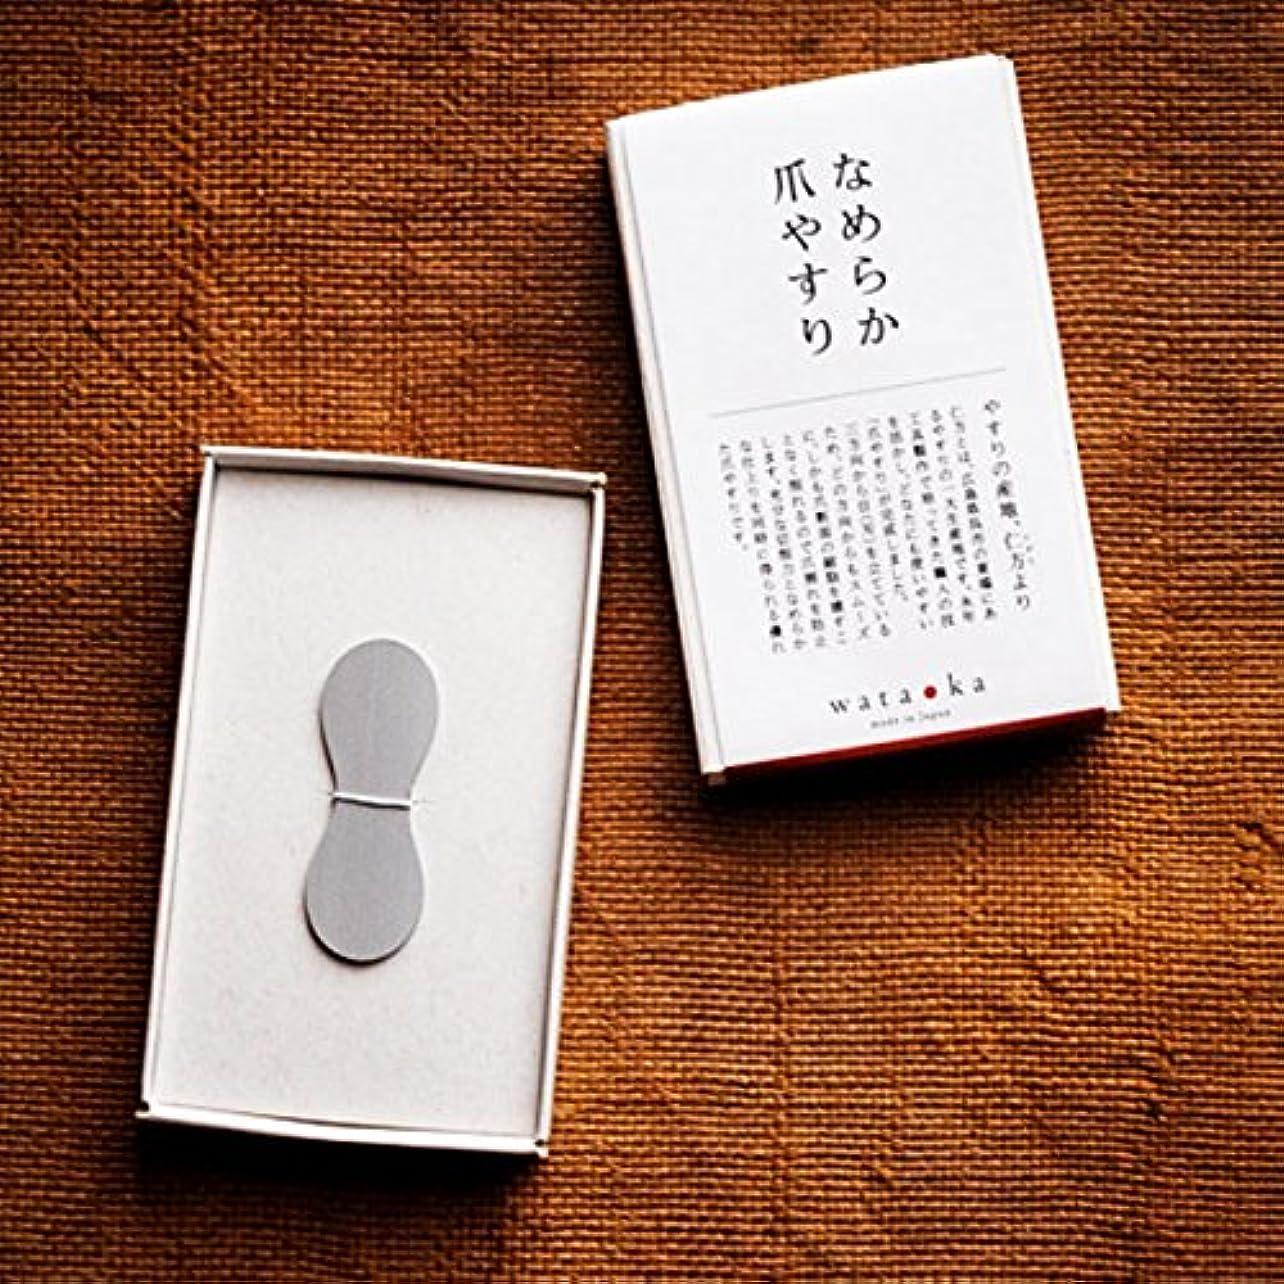 wataoka 鑢のワタオカ 爪やすり (専用パッケージ入り)